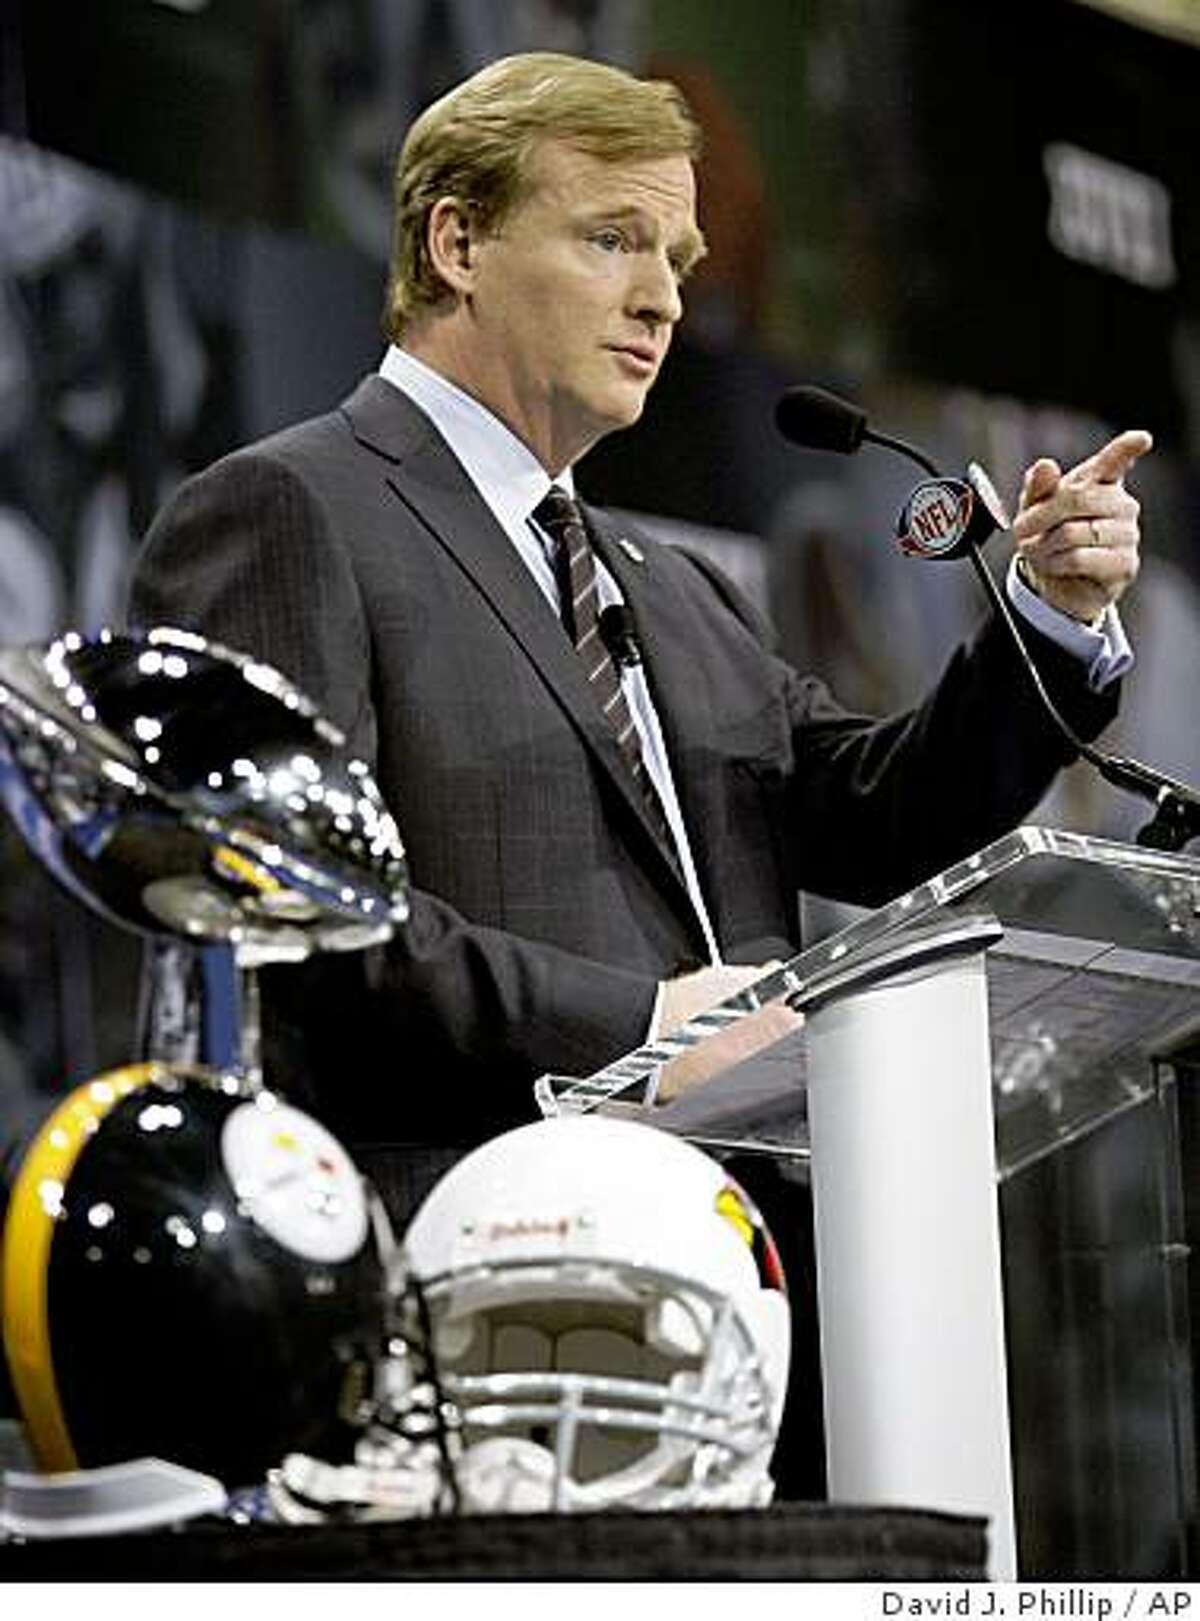 NFL Commissioner Roger Goodell speaks at a news conference for Super Bowl XLIII Friday, Jan. 30, 2009, in Tampa.